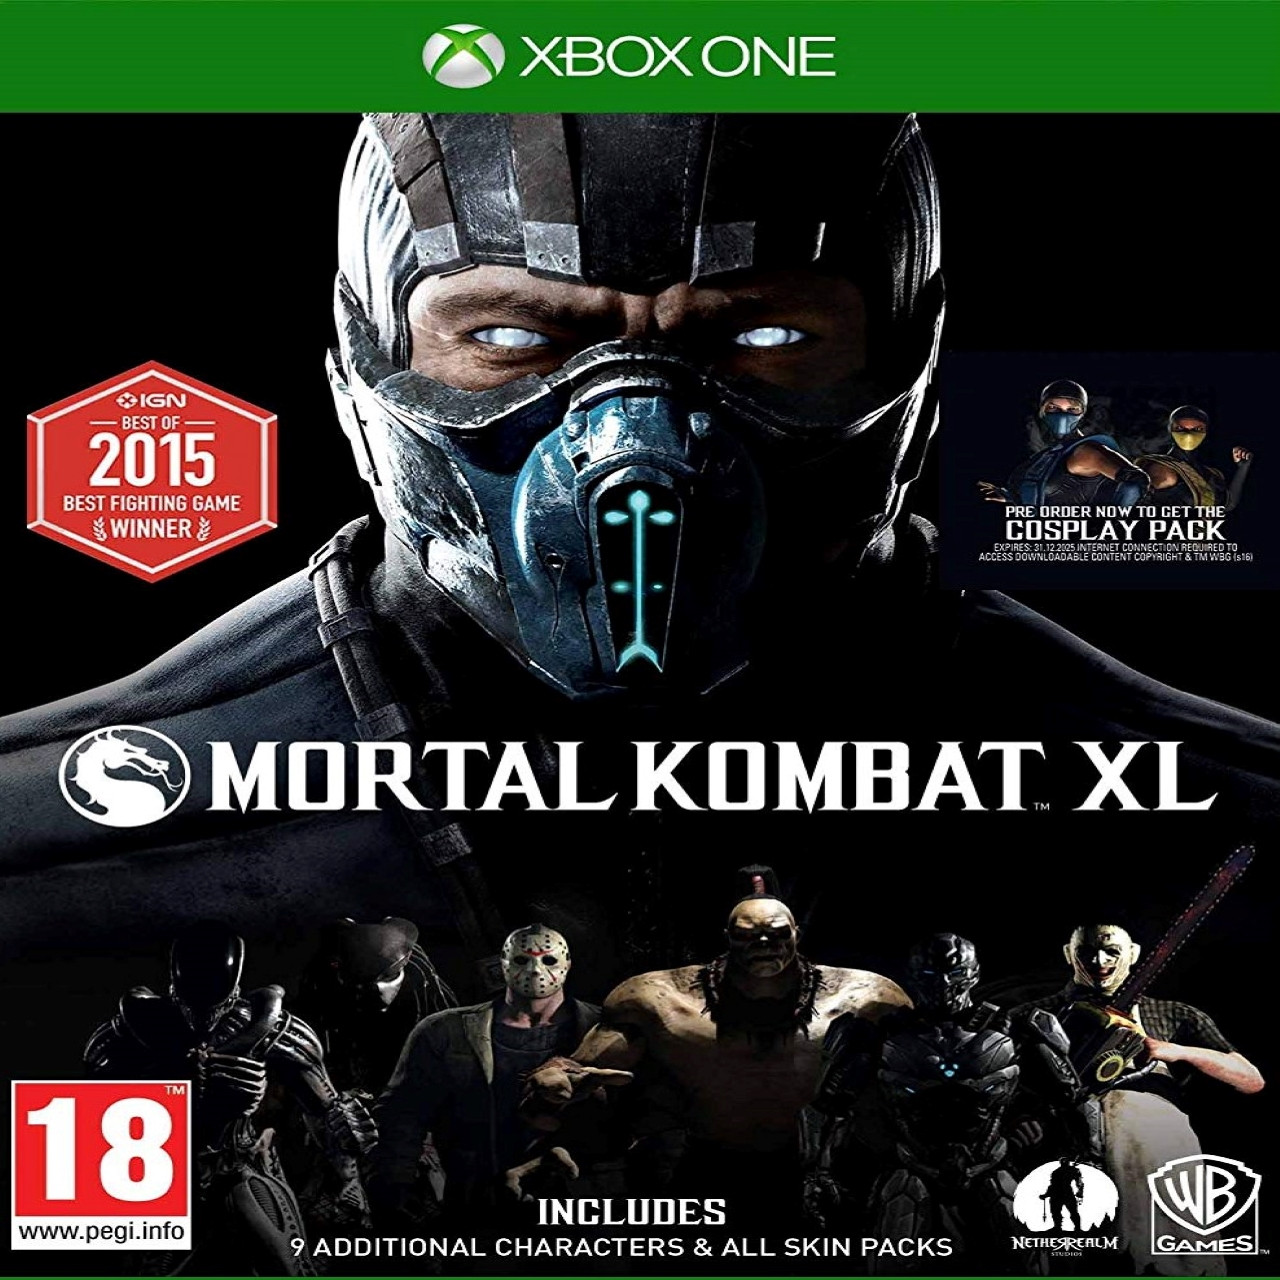 Mortal Kombat XL SUB XBOX ONE